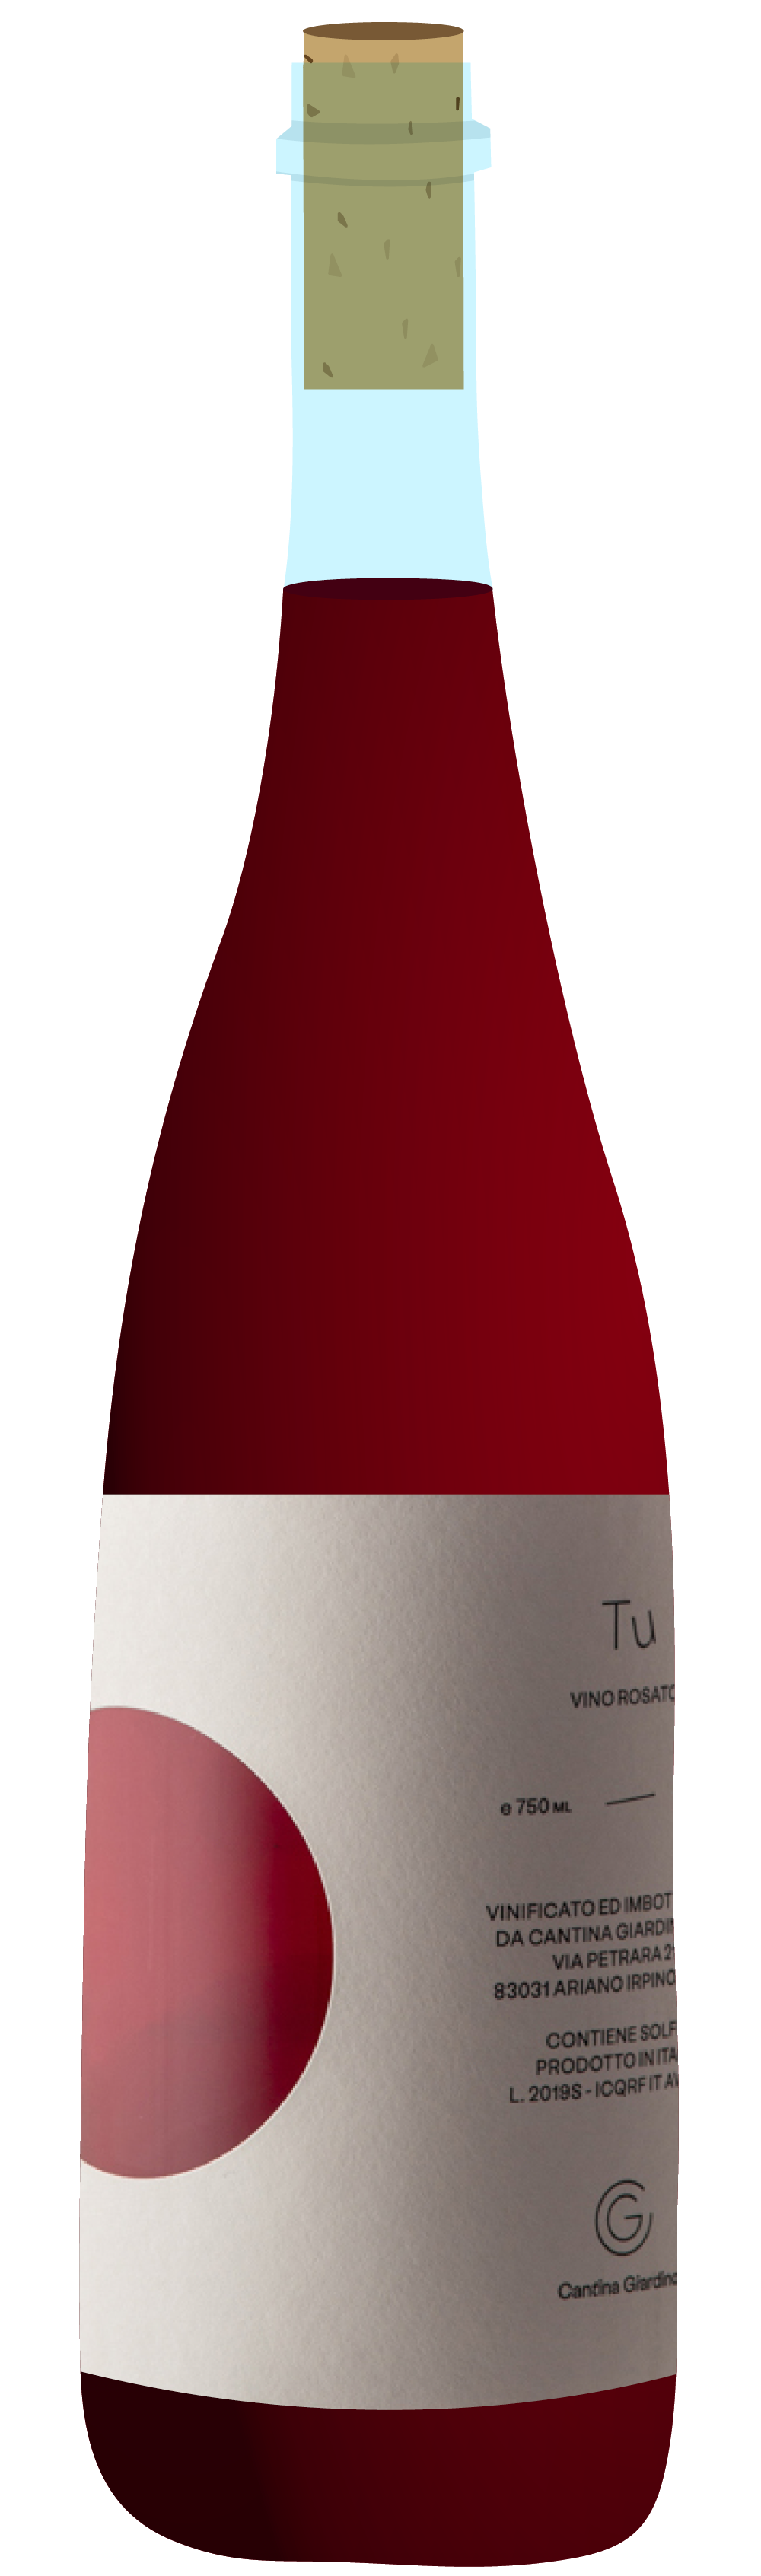 the natural wine company club august 2020 italy cantina giardino tu